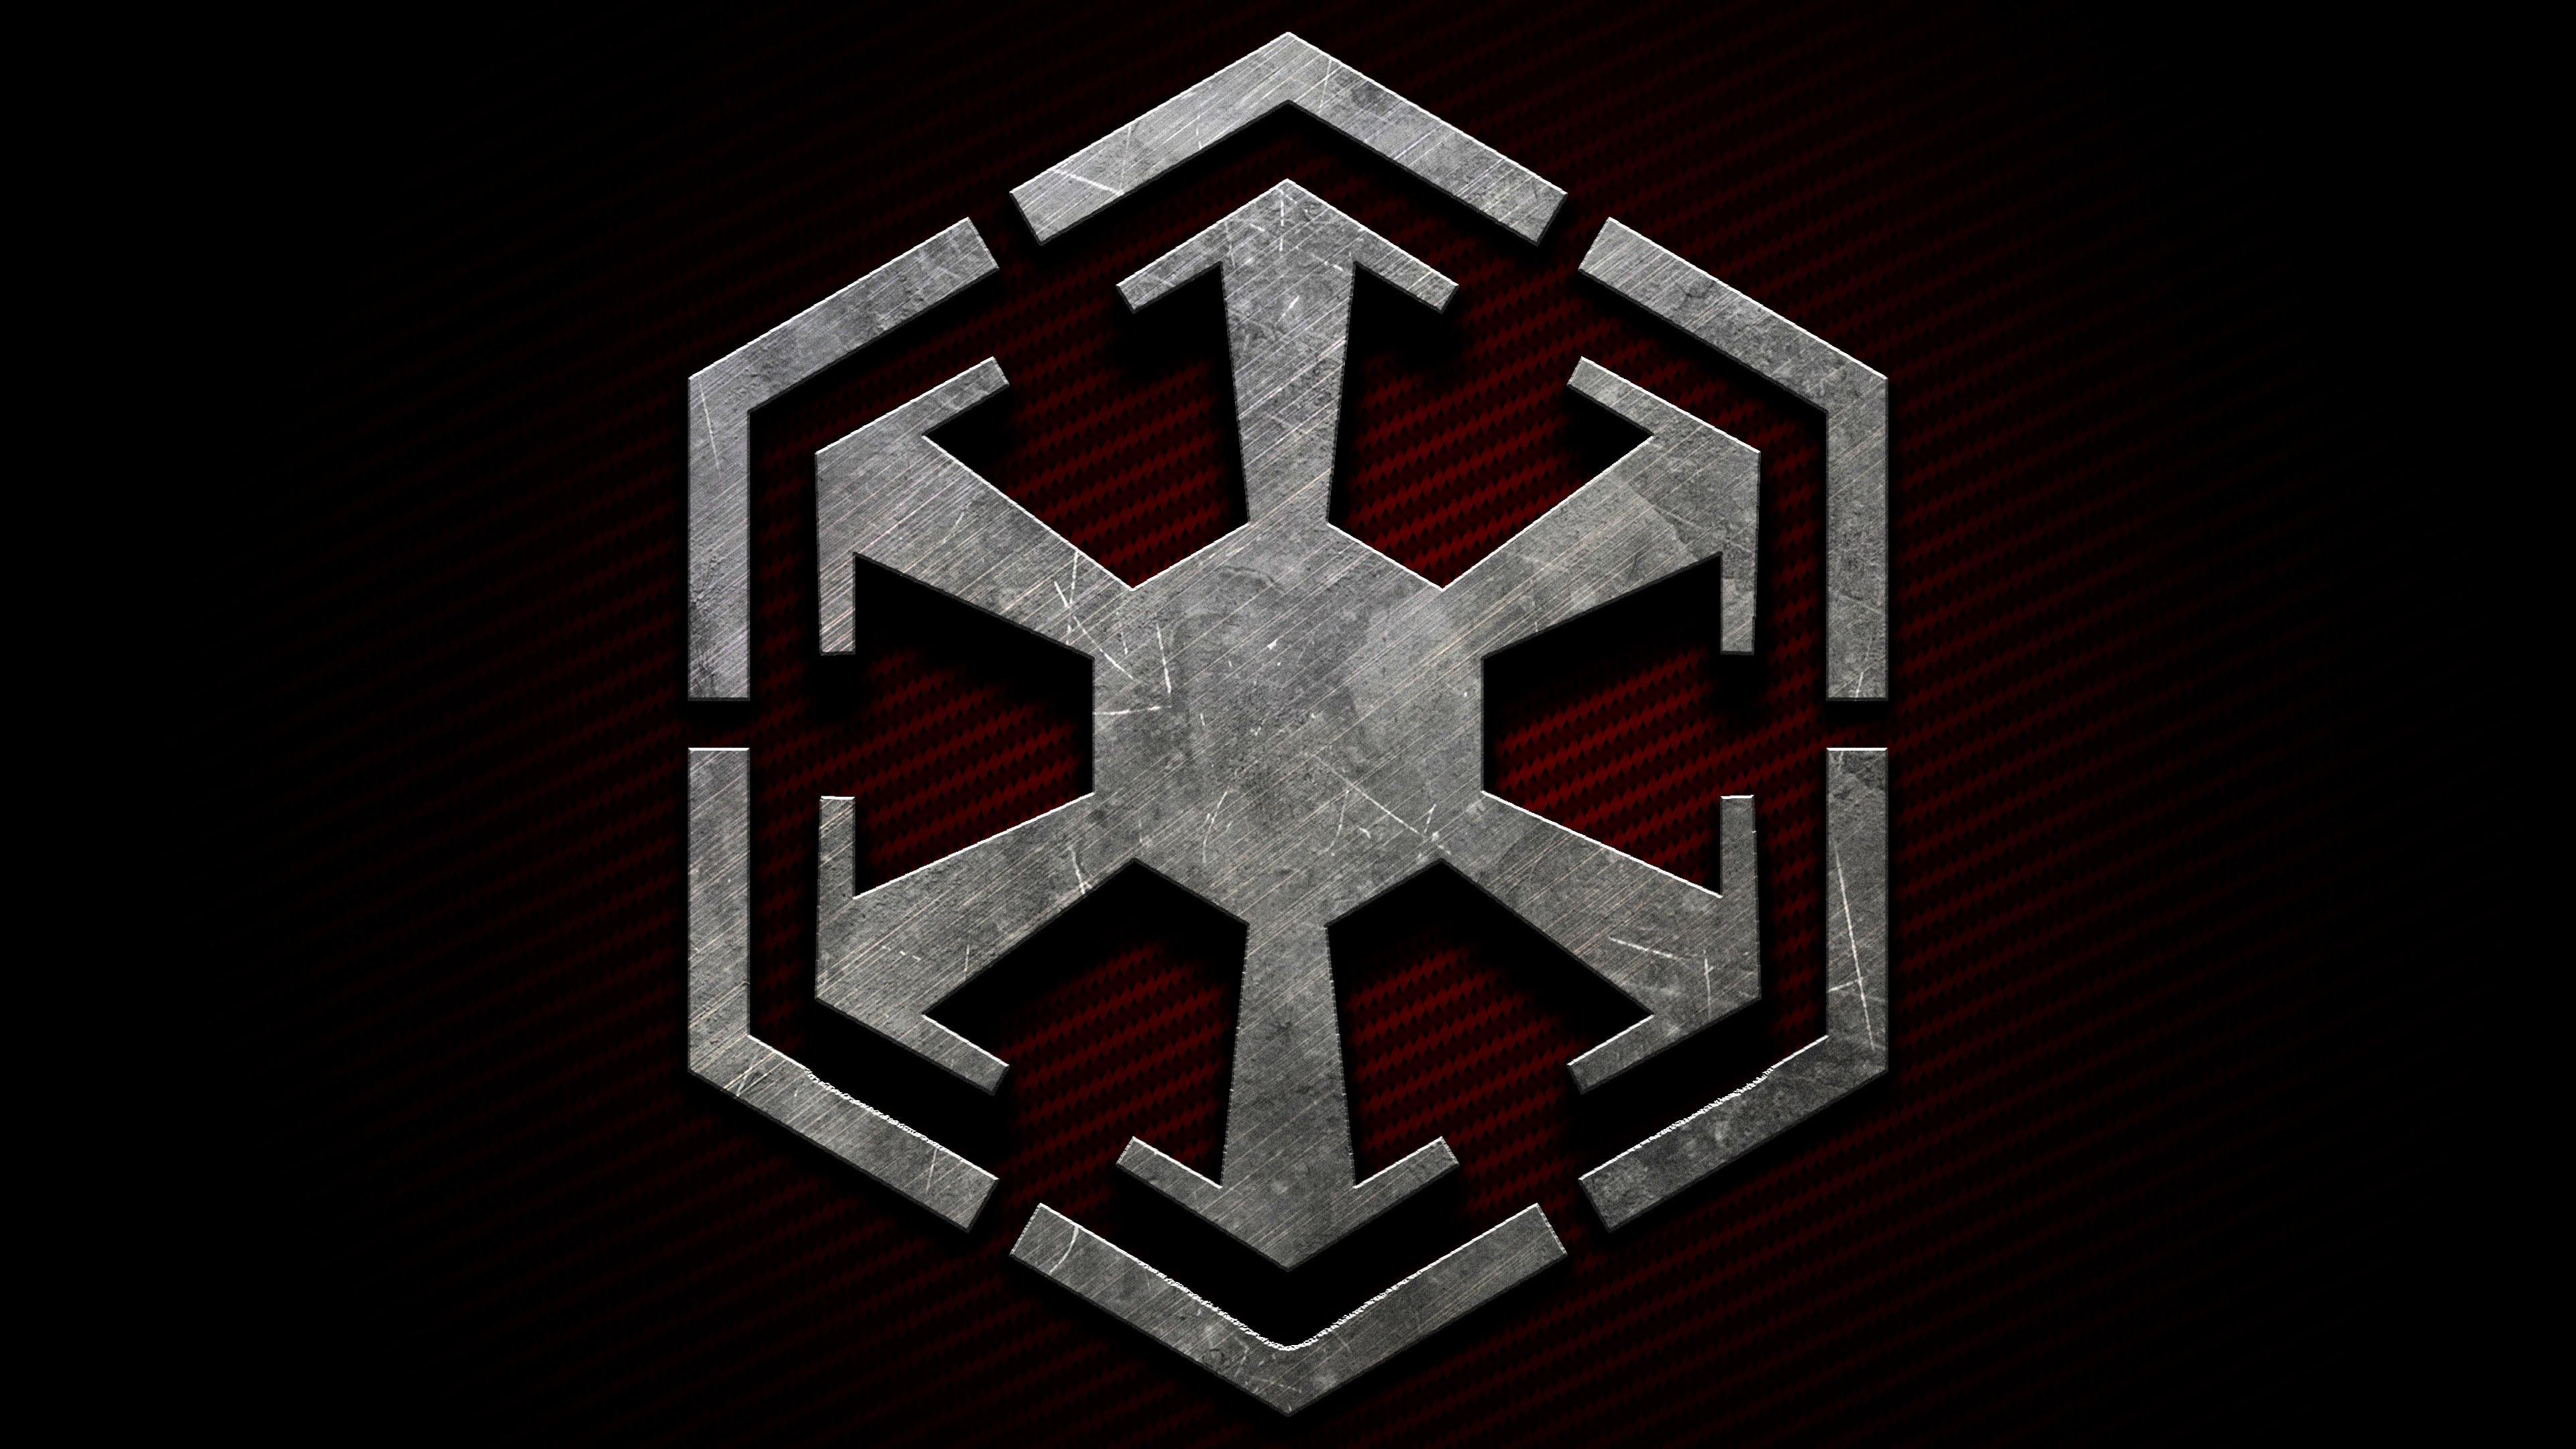 4k Star Wars Old Republic Empire symbol …